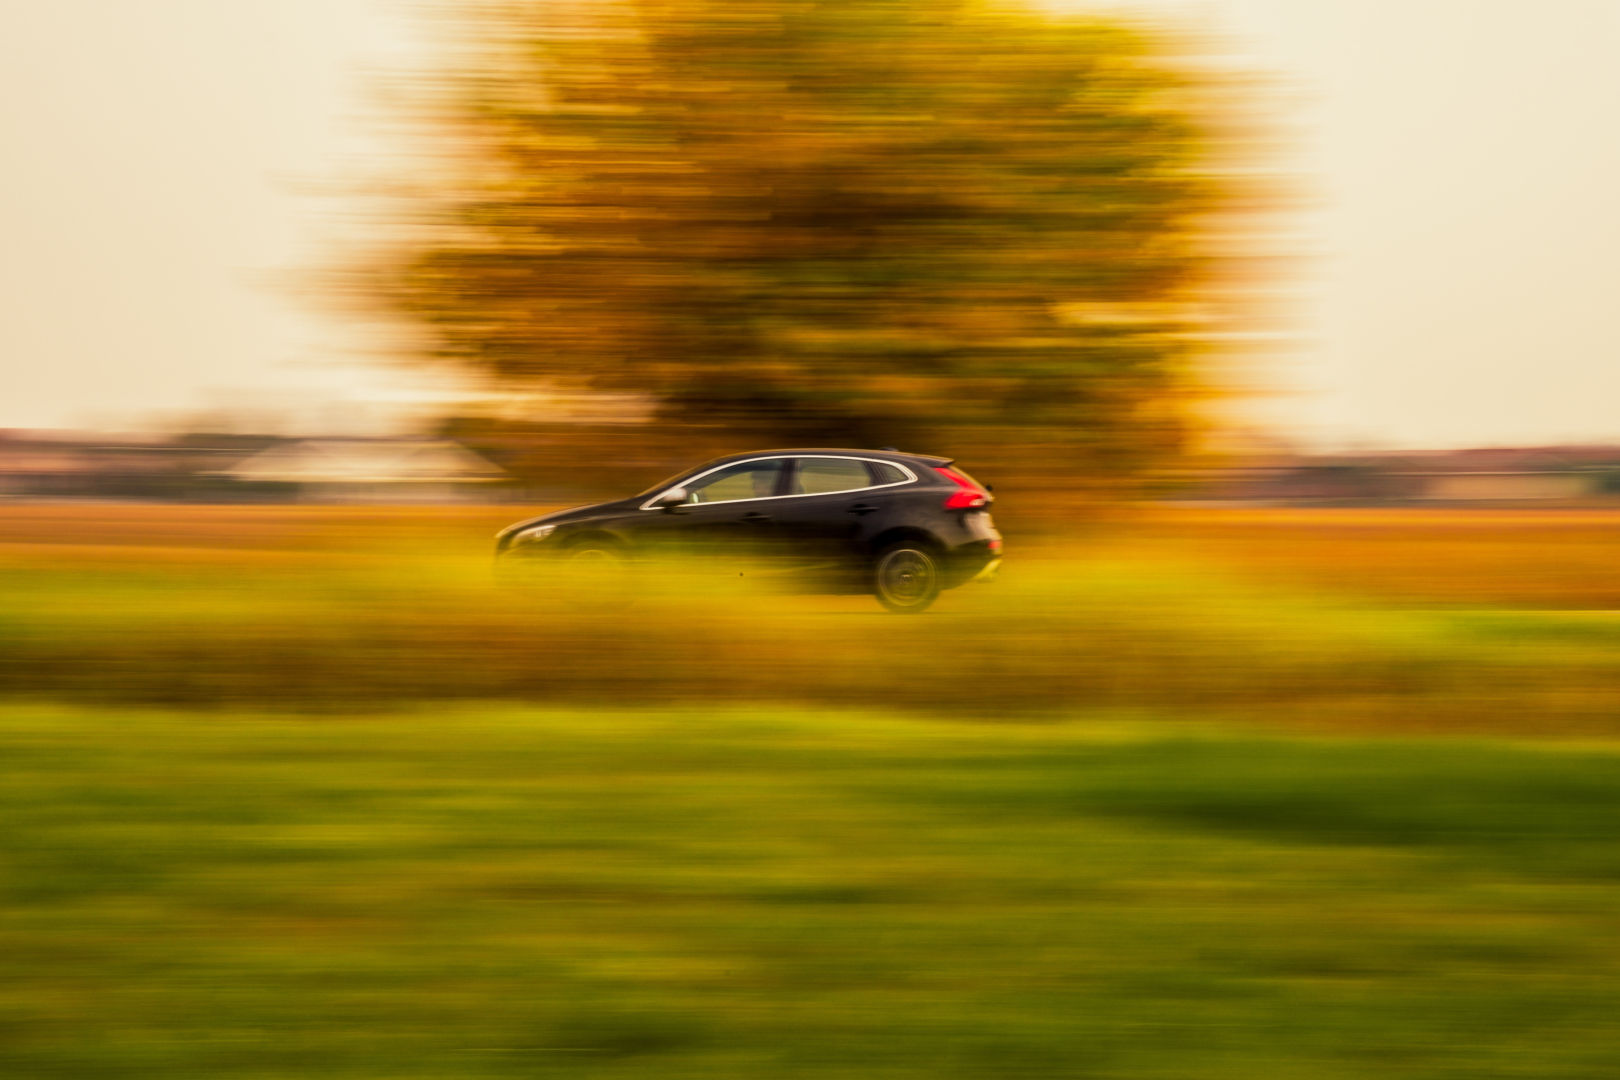 bg-driving-fast-countryside-411073-unsplash